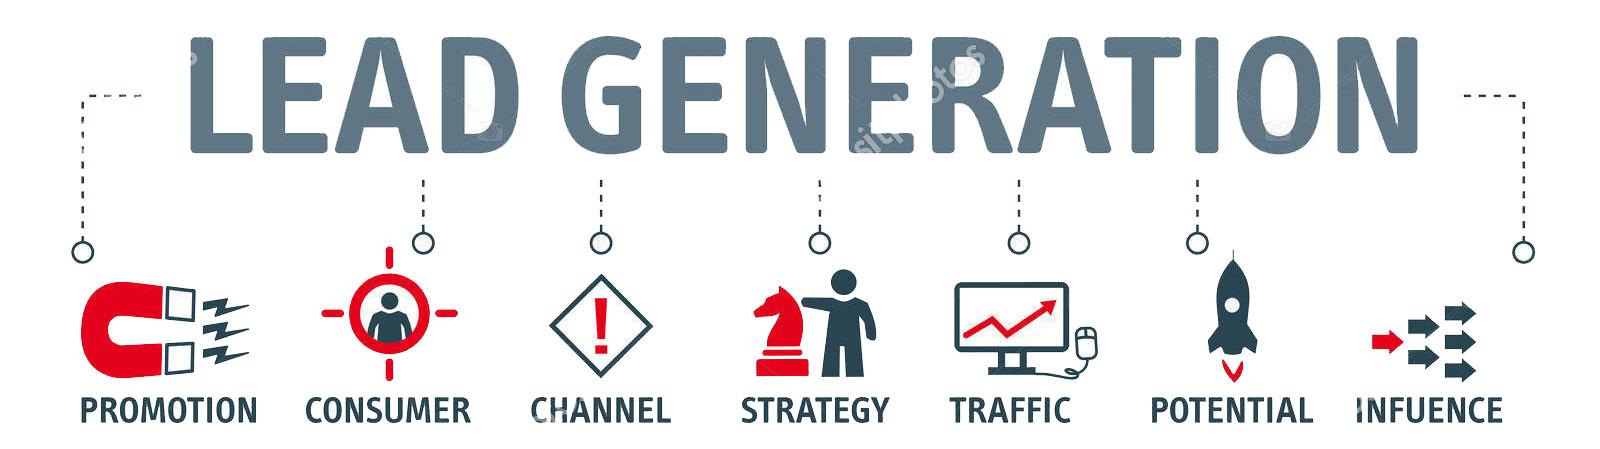 Lead Generation | Lead Alliance Marketing